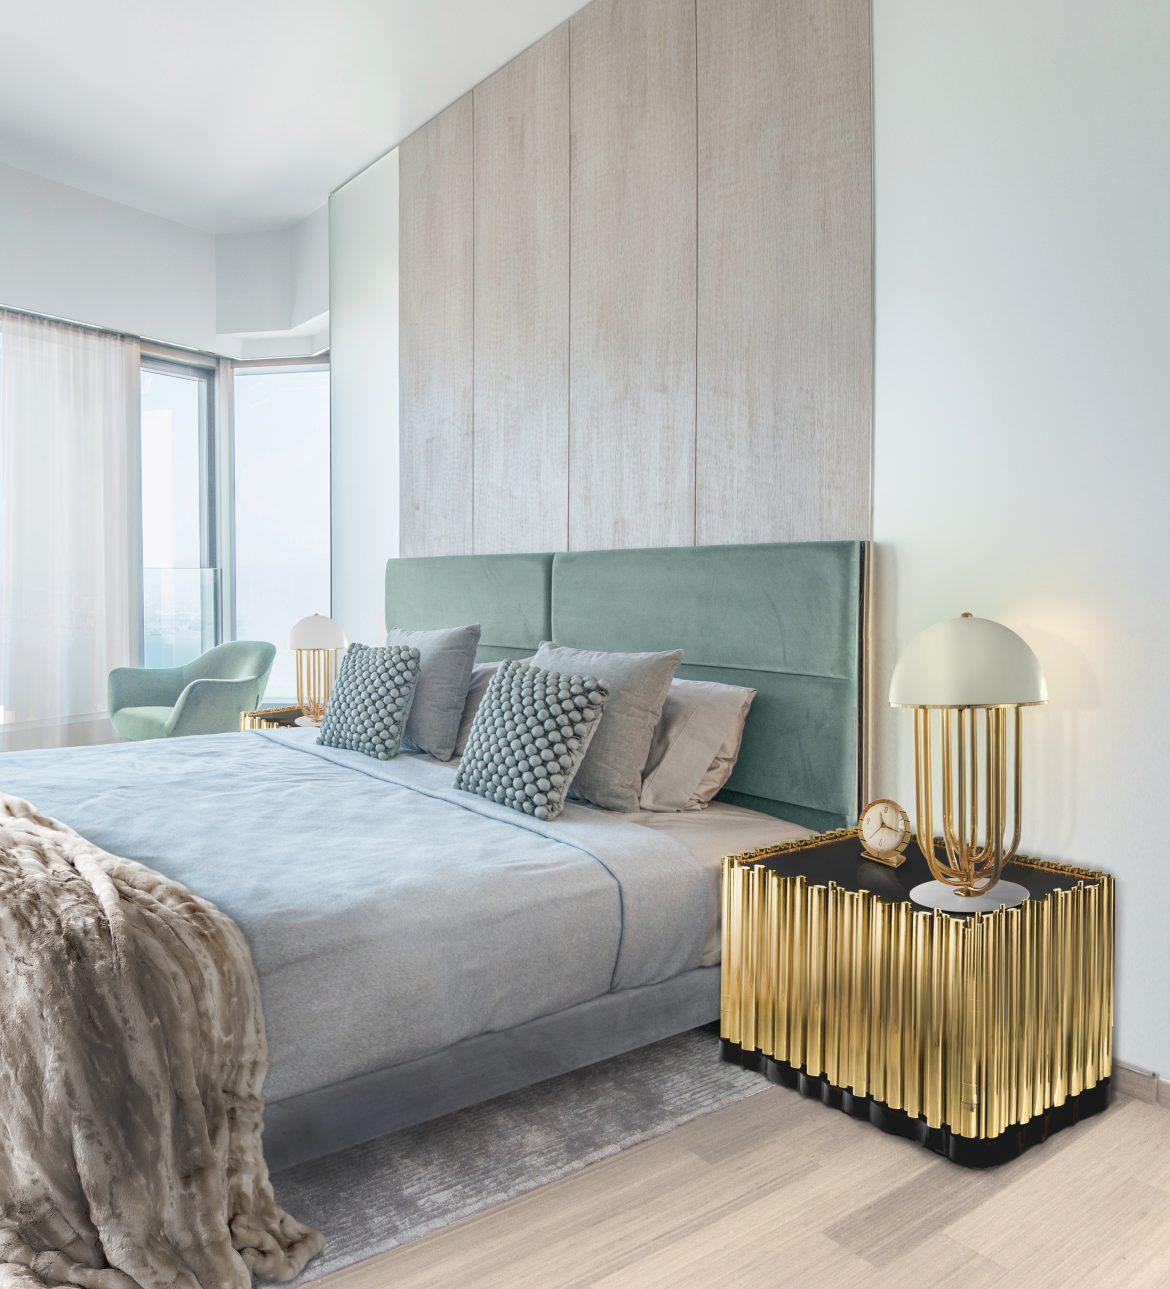 13 Amazing Bedroom Design Ideas bedroom design ideas 13 Amazing Bedroom Design Ideas 13 Amazing Bedroom Design Ideas 2